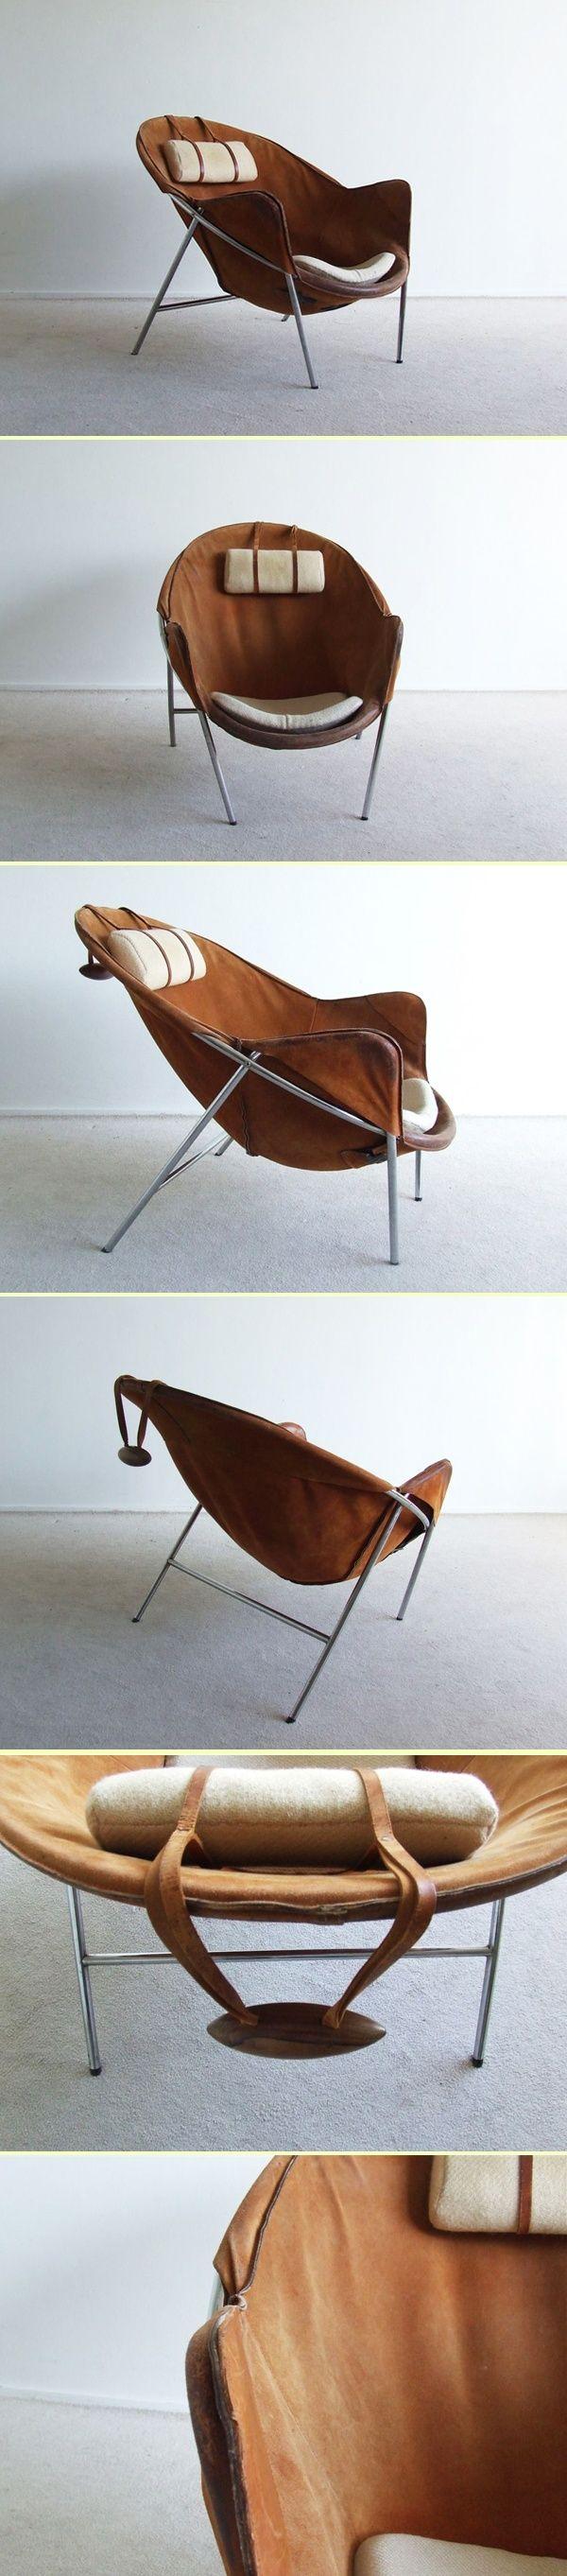 Lounge chair Erik Ole Jorgensen lounge chair